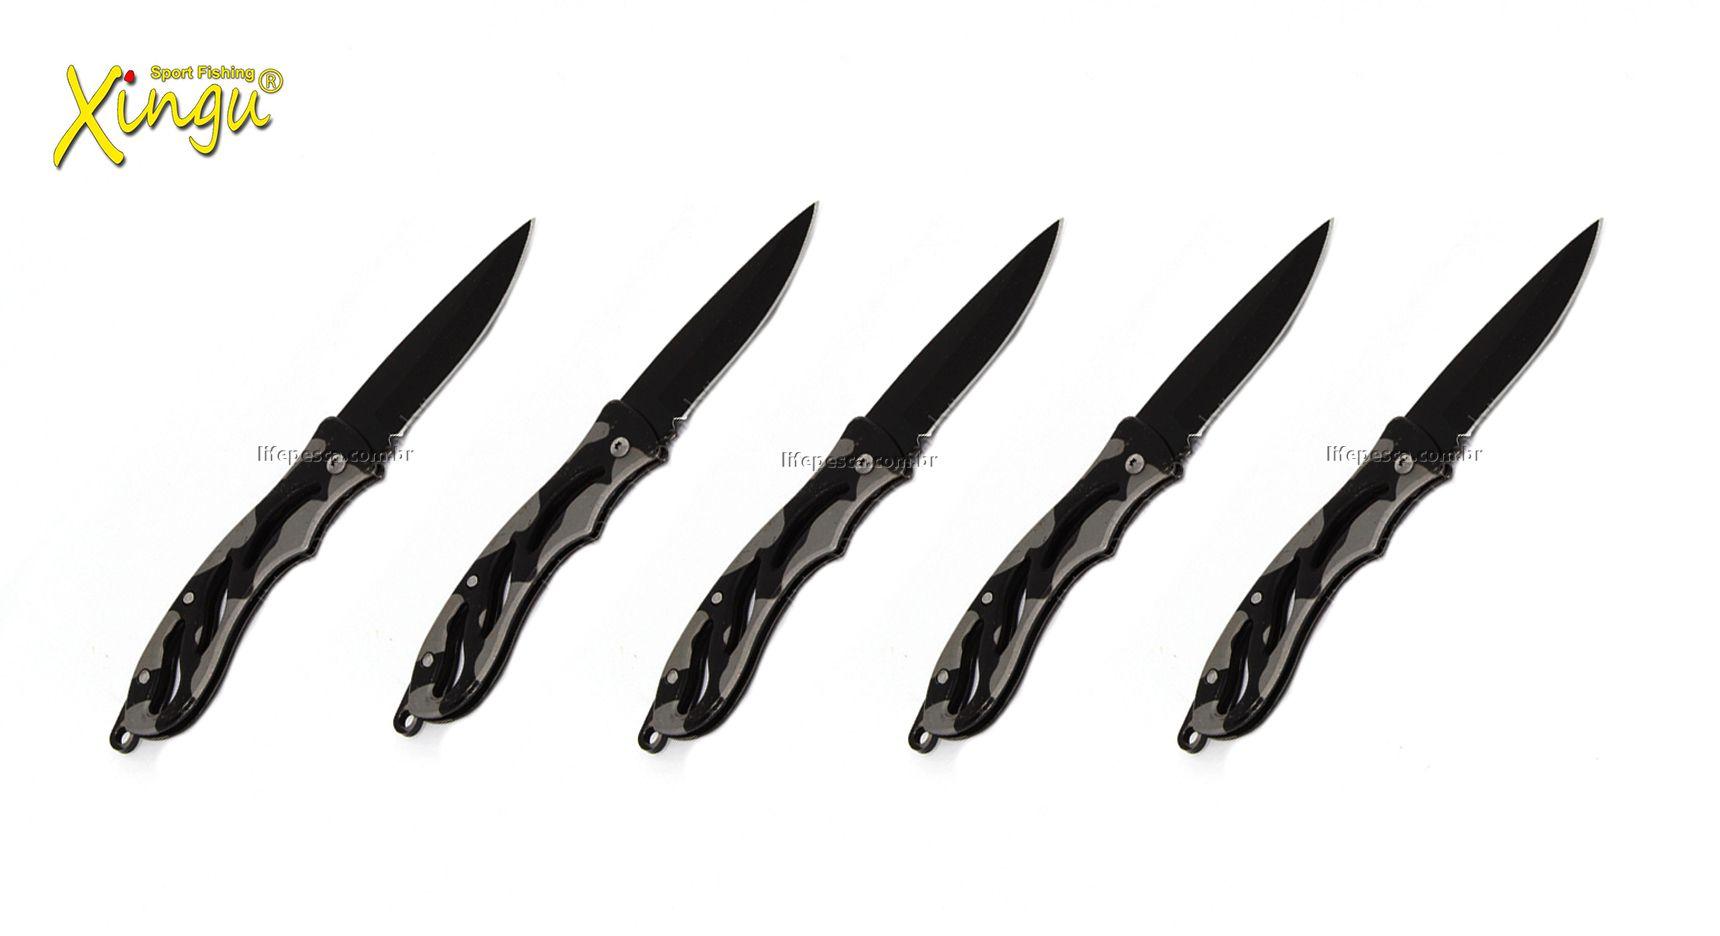 Kit 5 Canivetes Xingu Xv2929 - Cabo Metal Camuflado Cinza